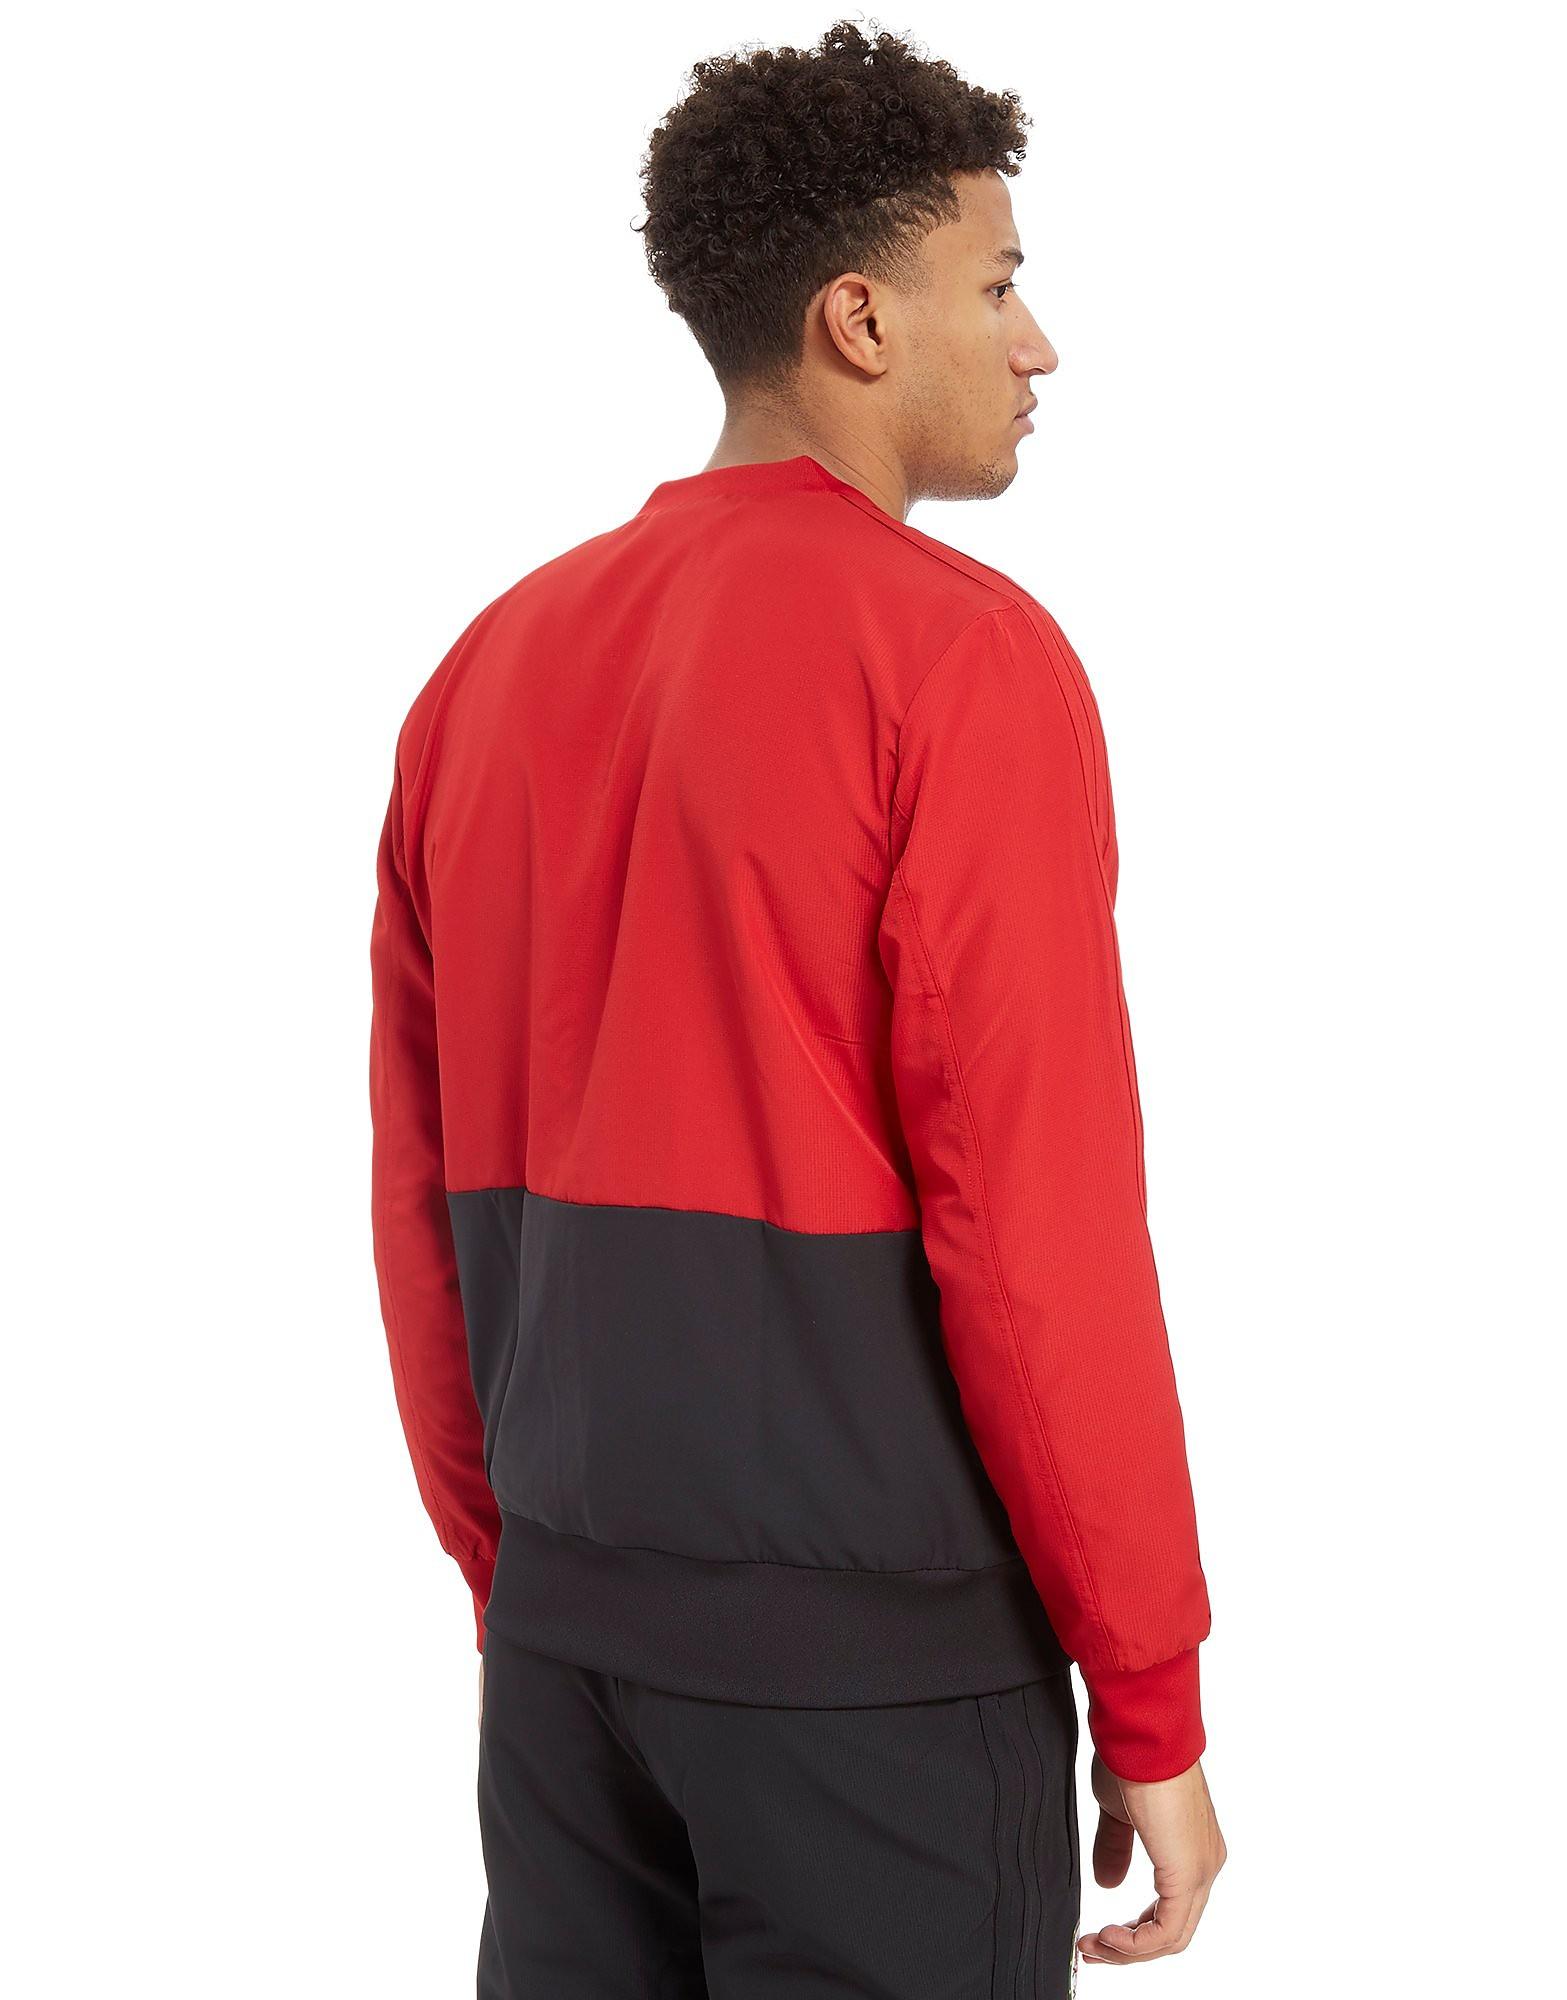 adidas FA Wales 2018 Presentation Jacket